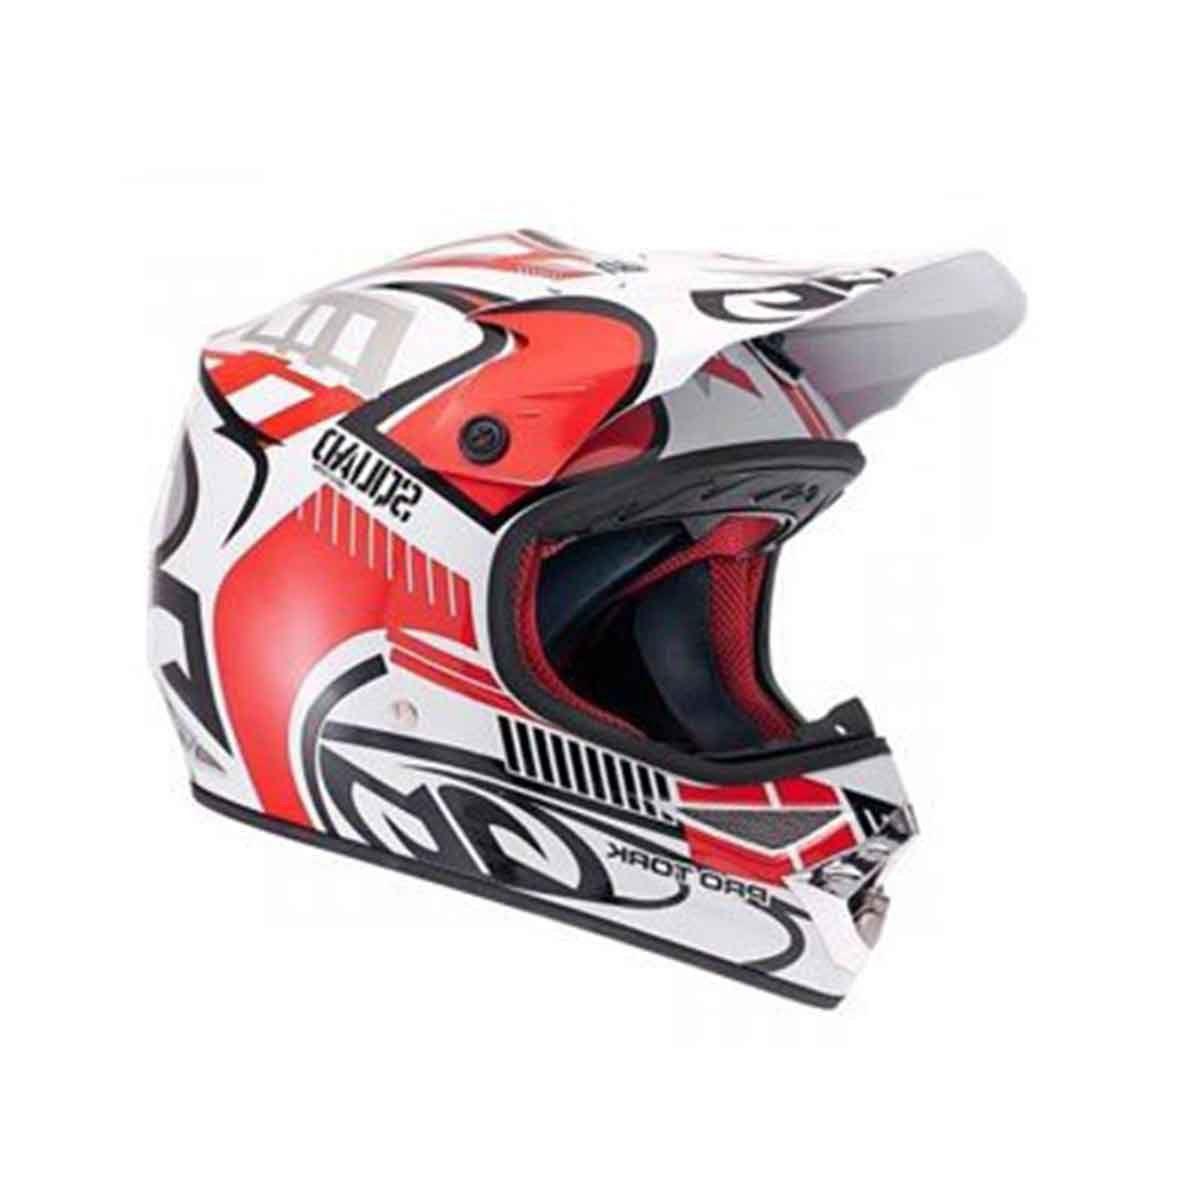 Capacete para Motocross Protork Squad Vermelho